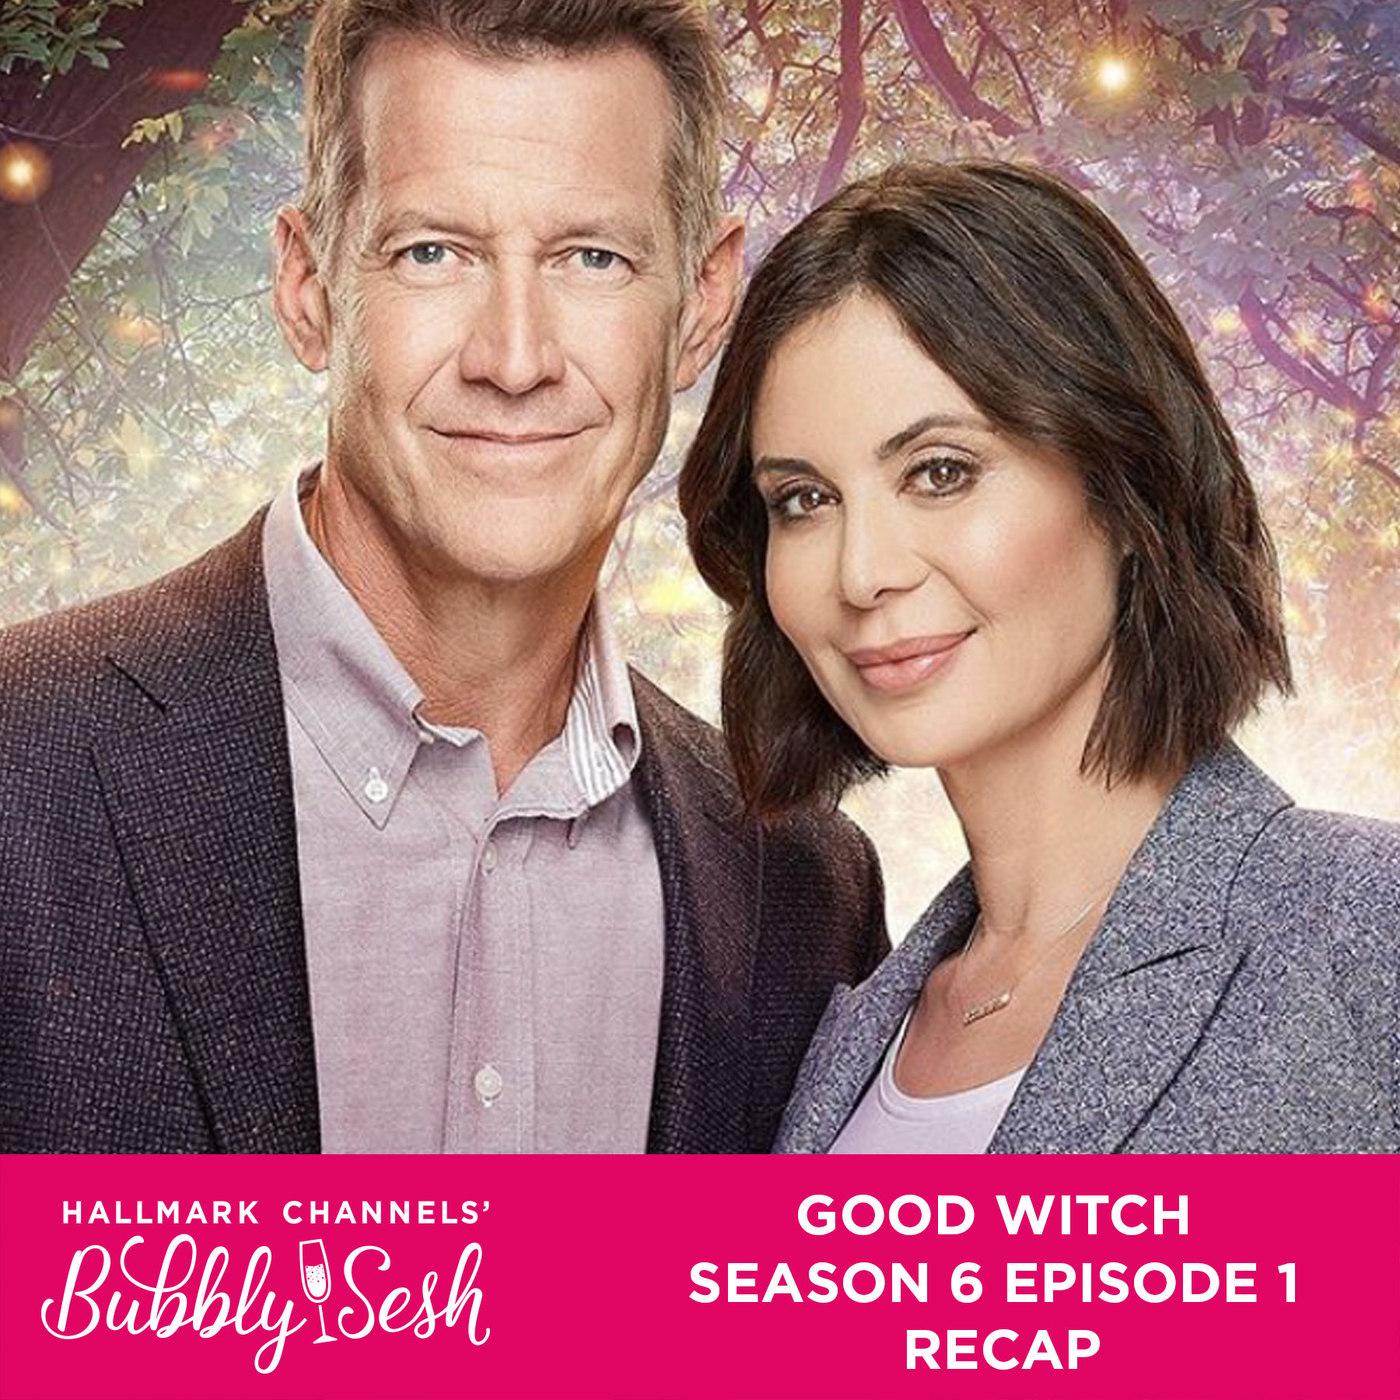 Good Witch, Season 6, Episode 1 Recap